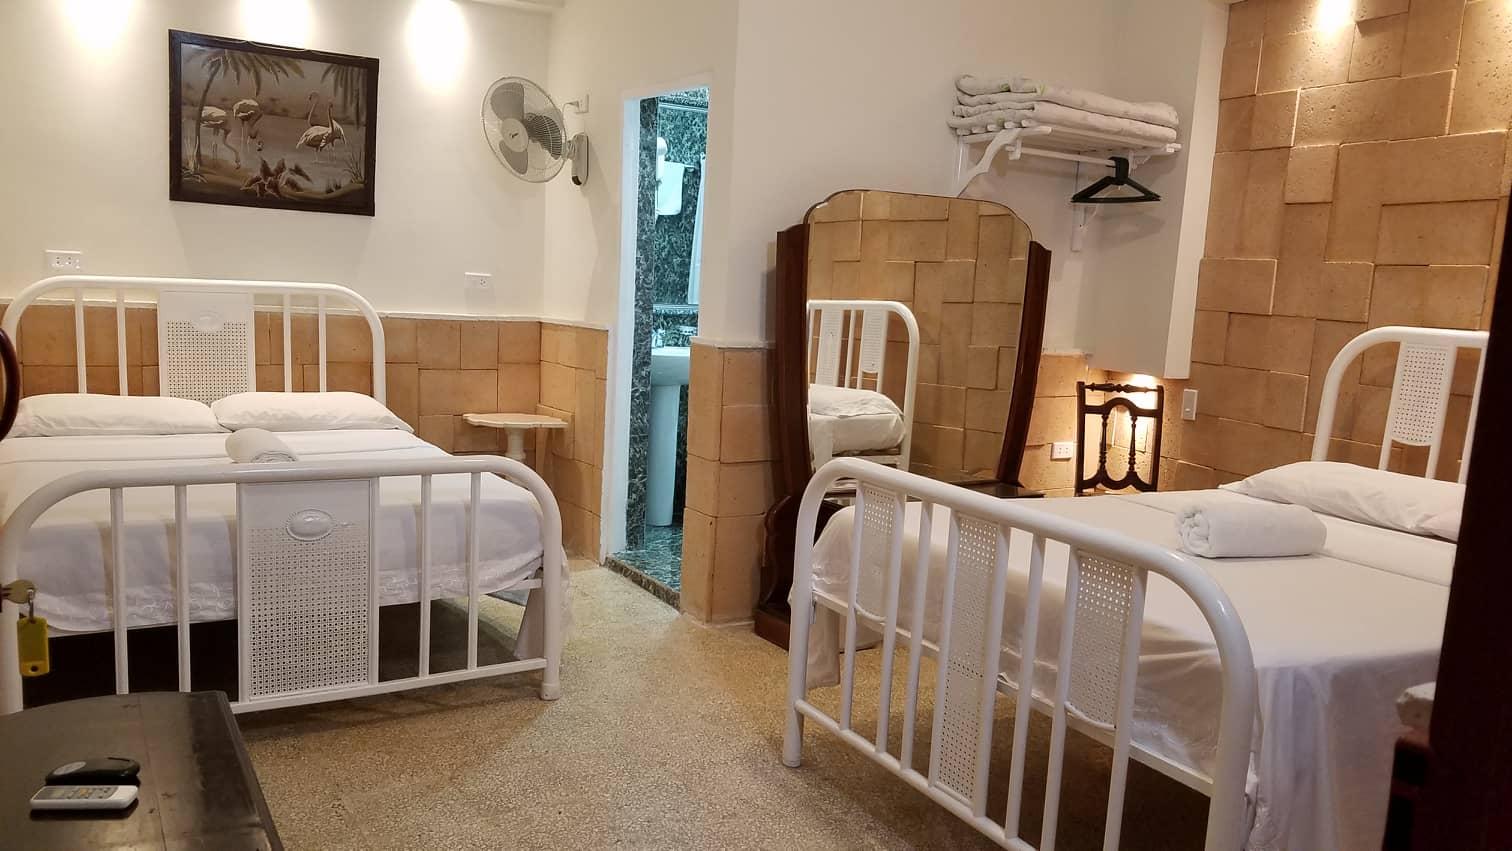 TRN017 – Room 1 Quadruple room with private bathroom